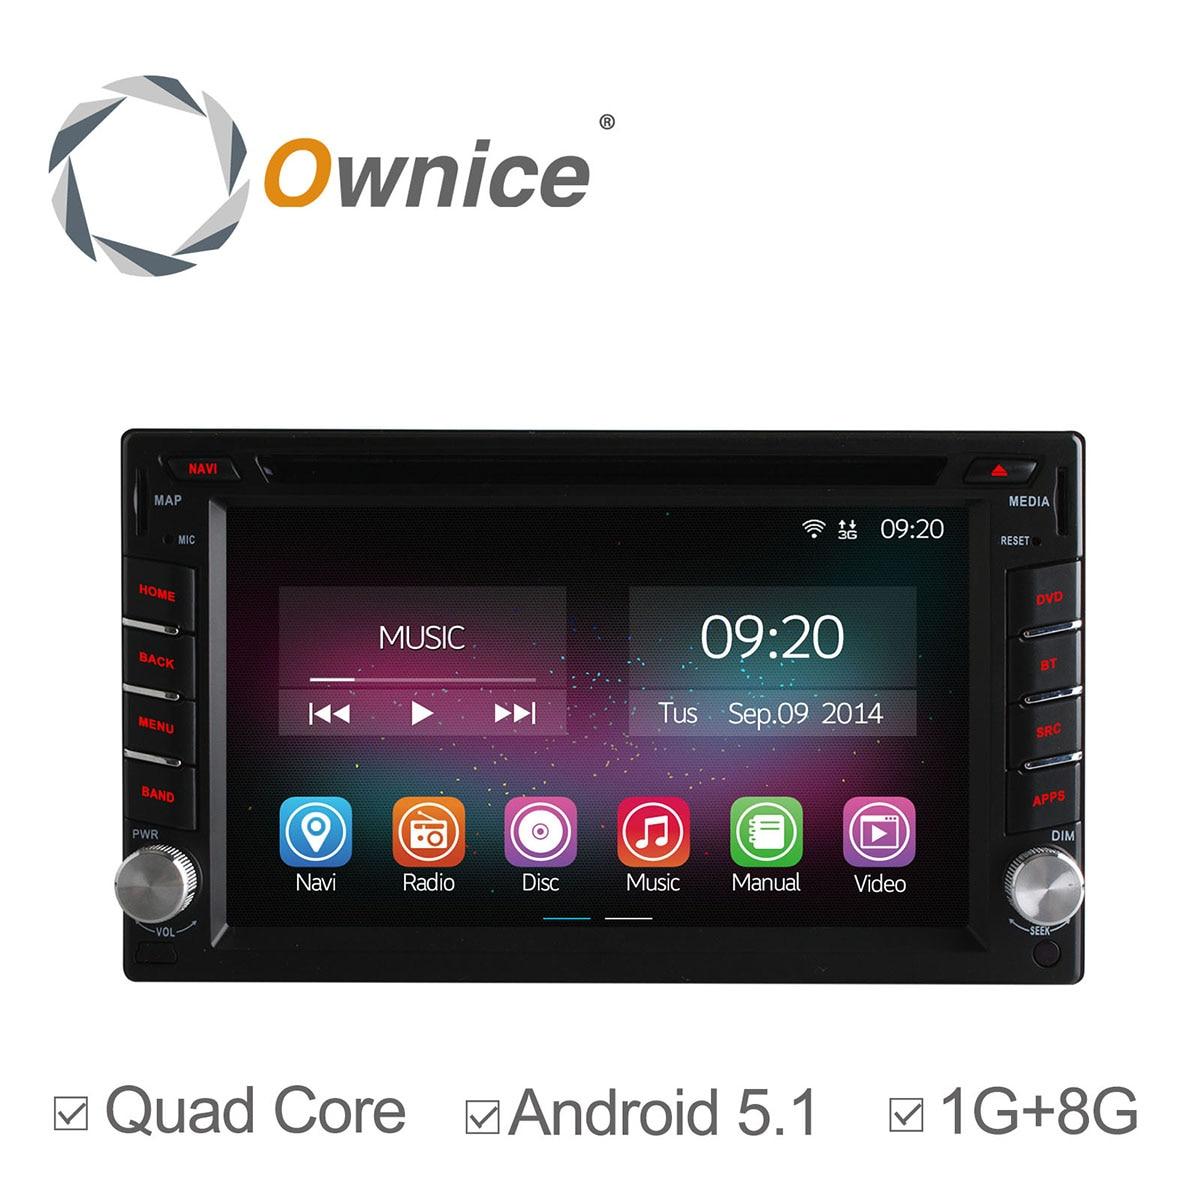 Ownice C200 Quad Core font b Android b font 5 1 Car DVD GPS Navigation 2Din